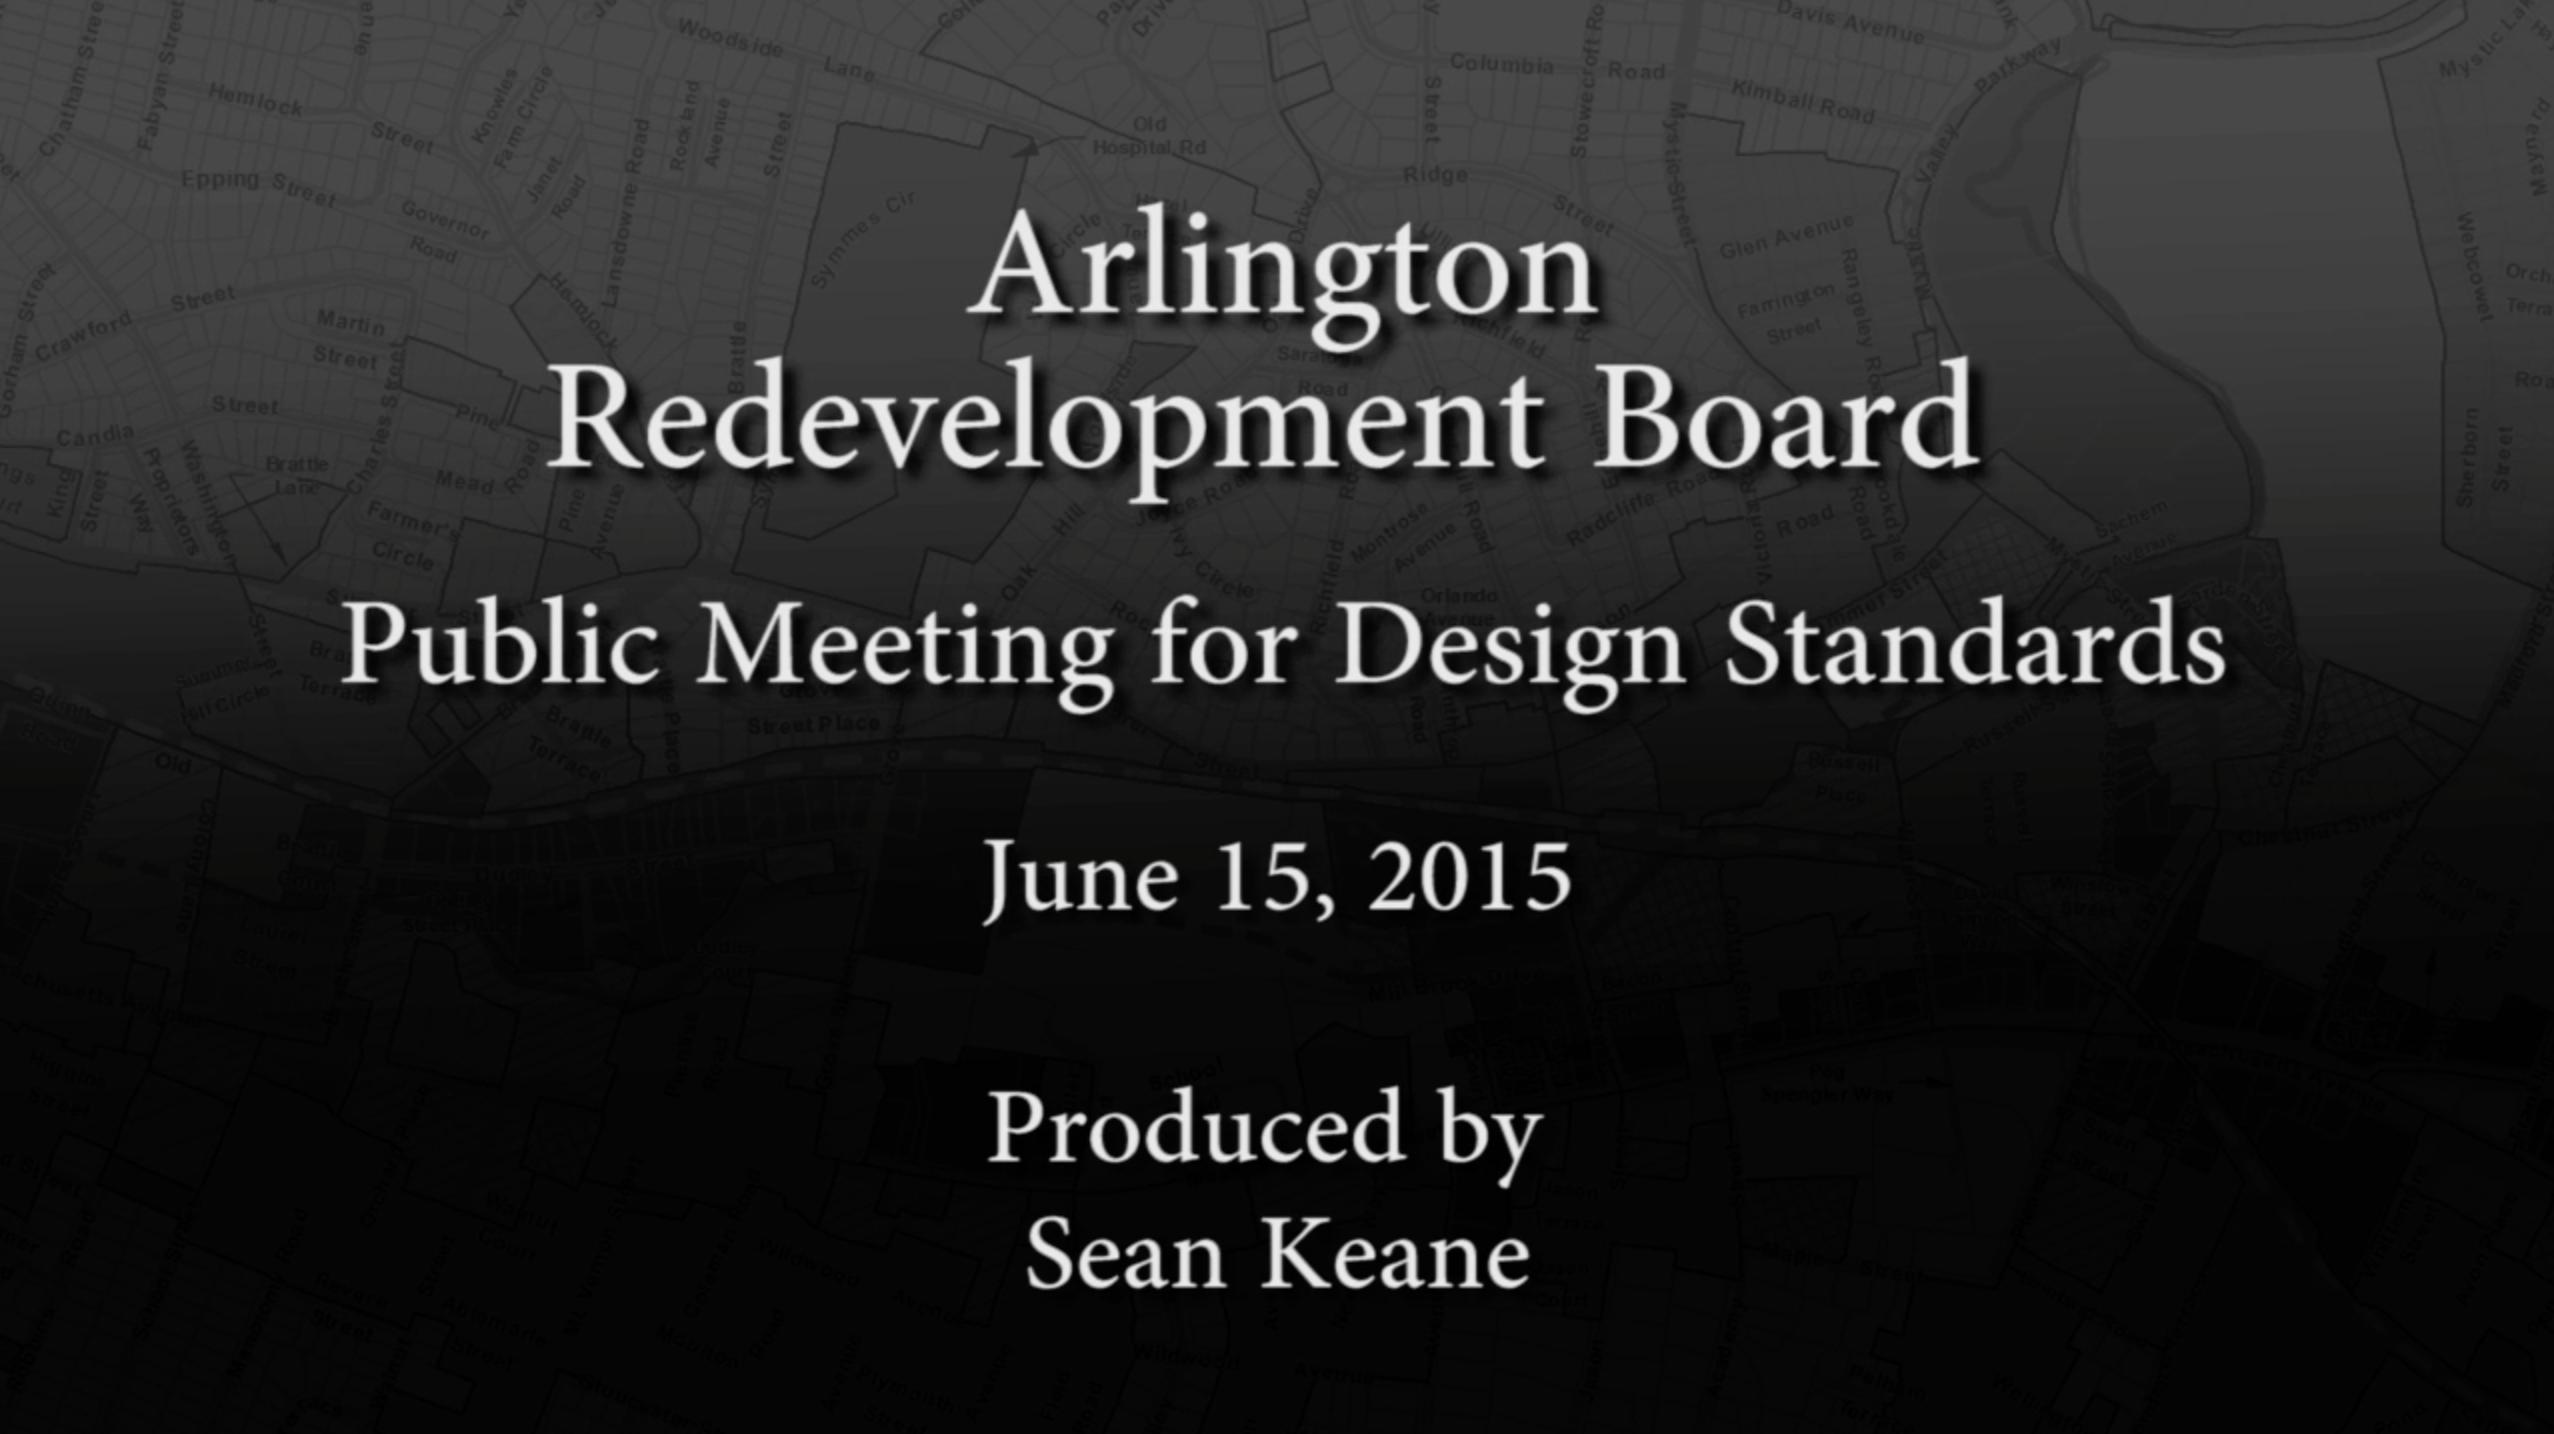 Redevelopment Board: Public Meeting for Design Standards – June 15, 2015